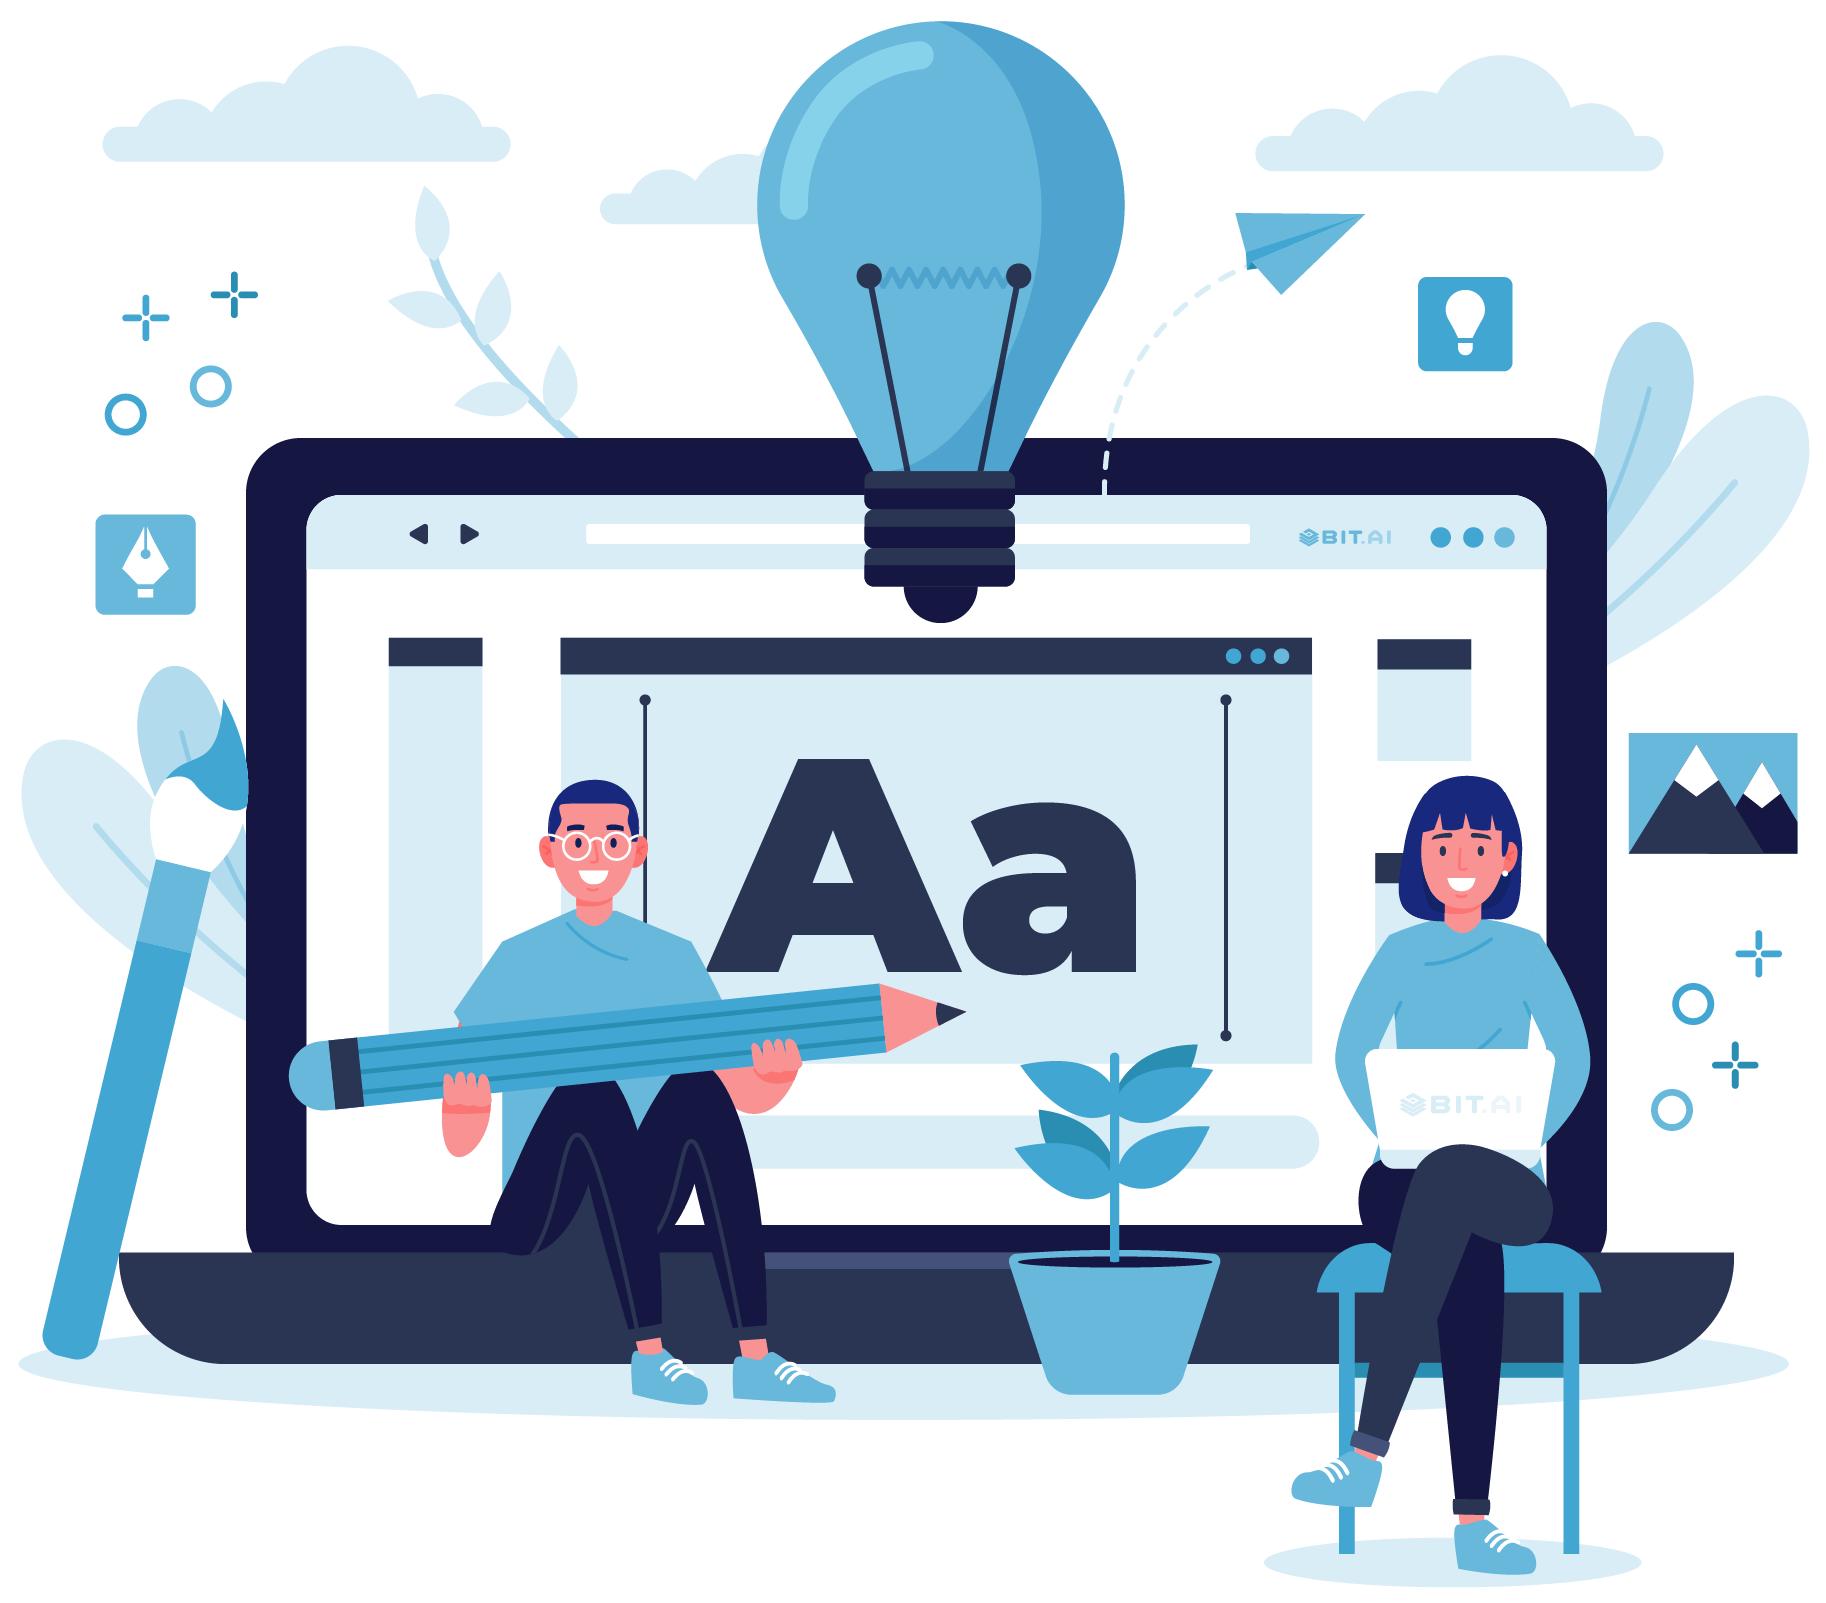 Web designing as online business idea